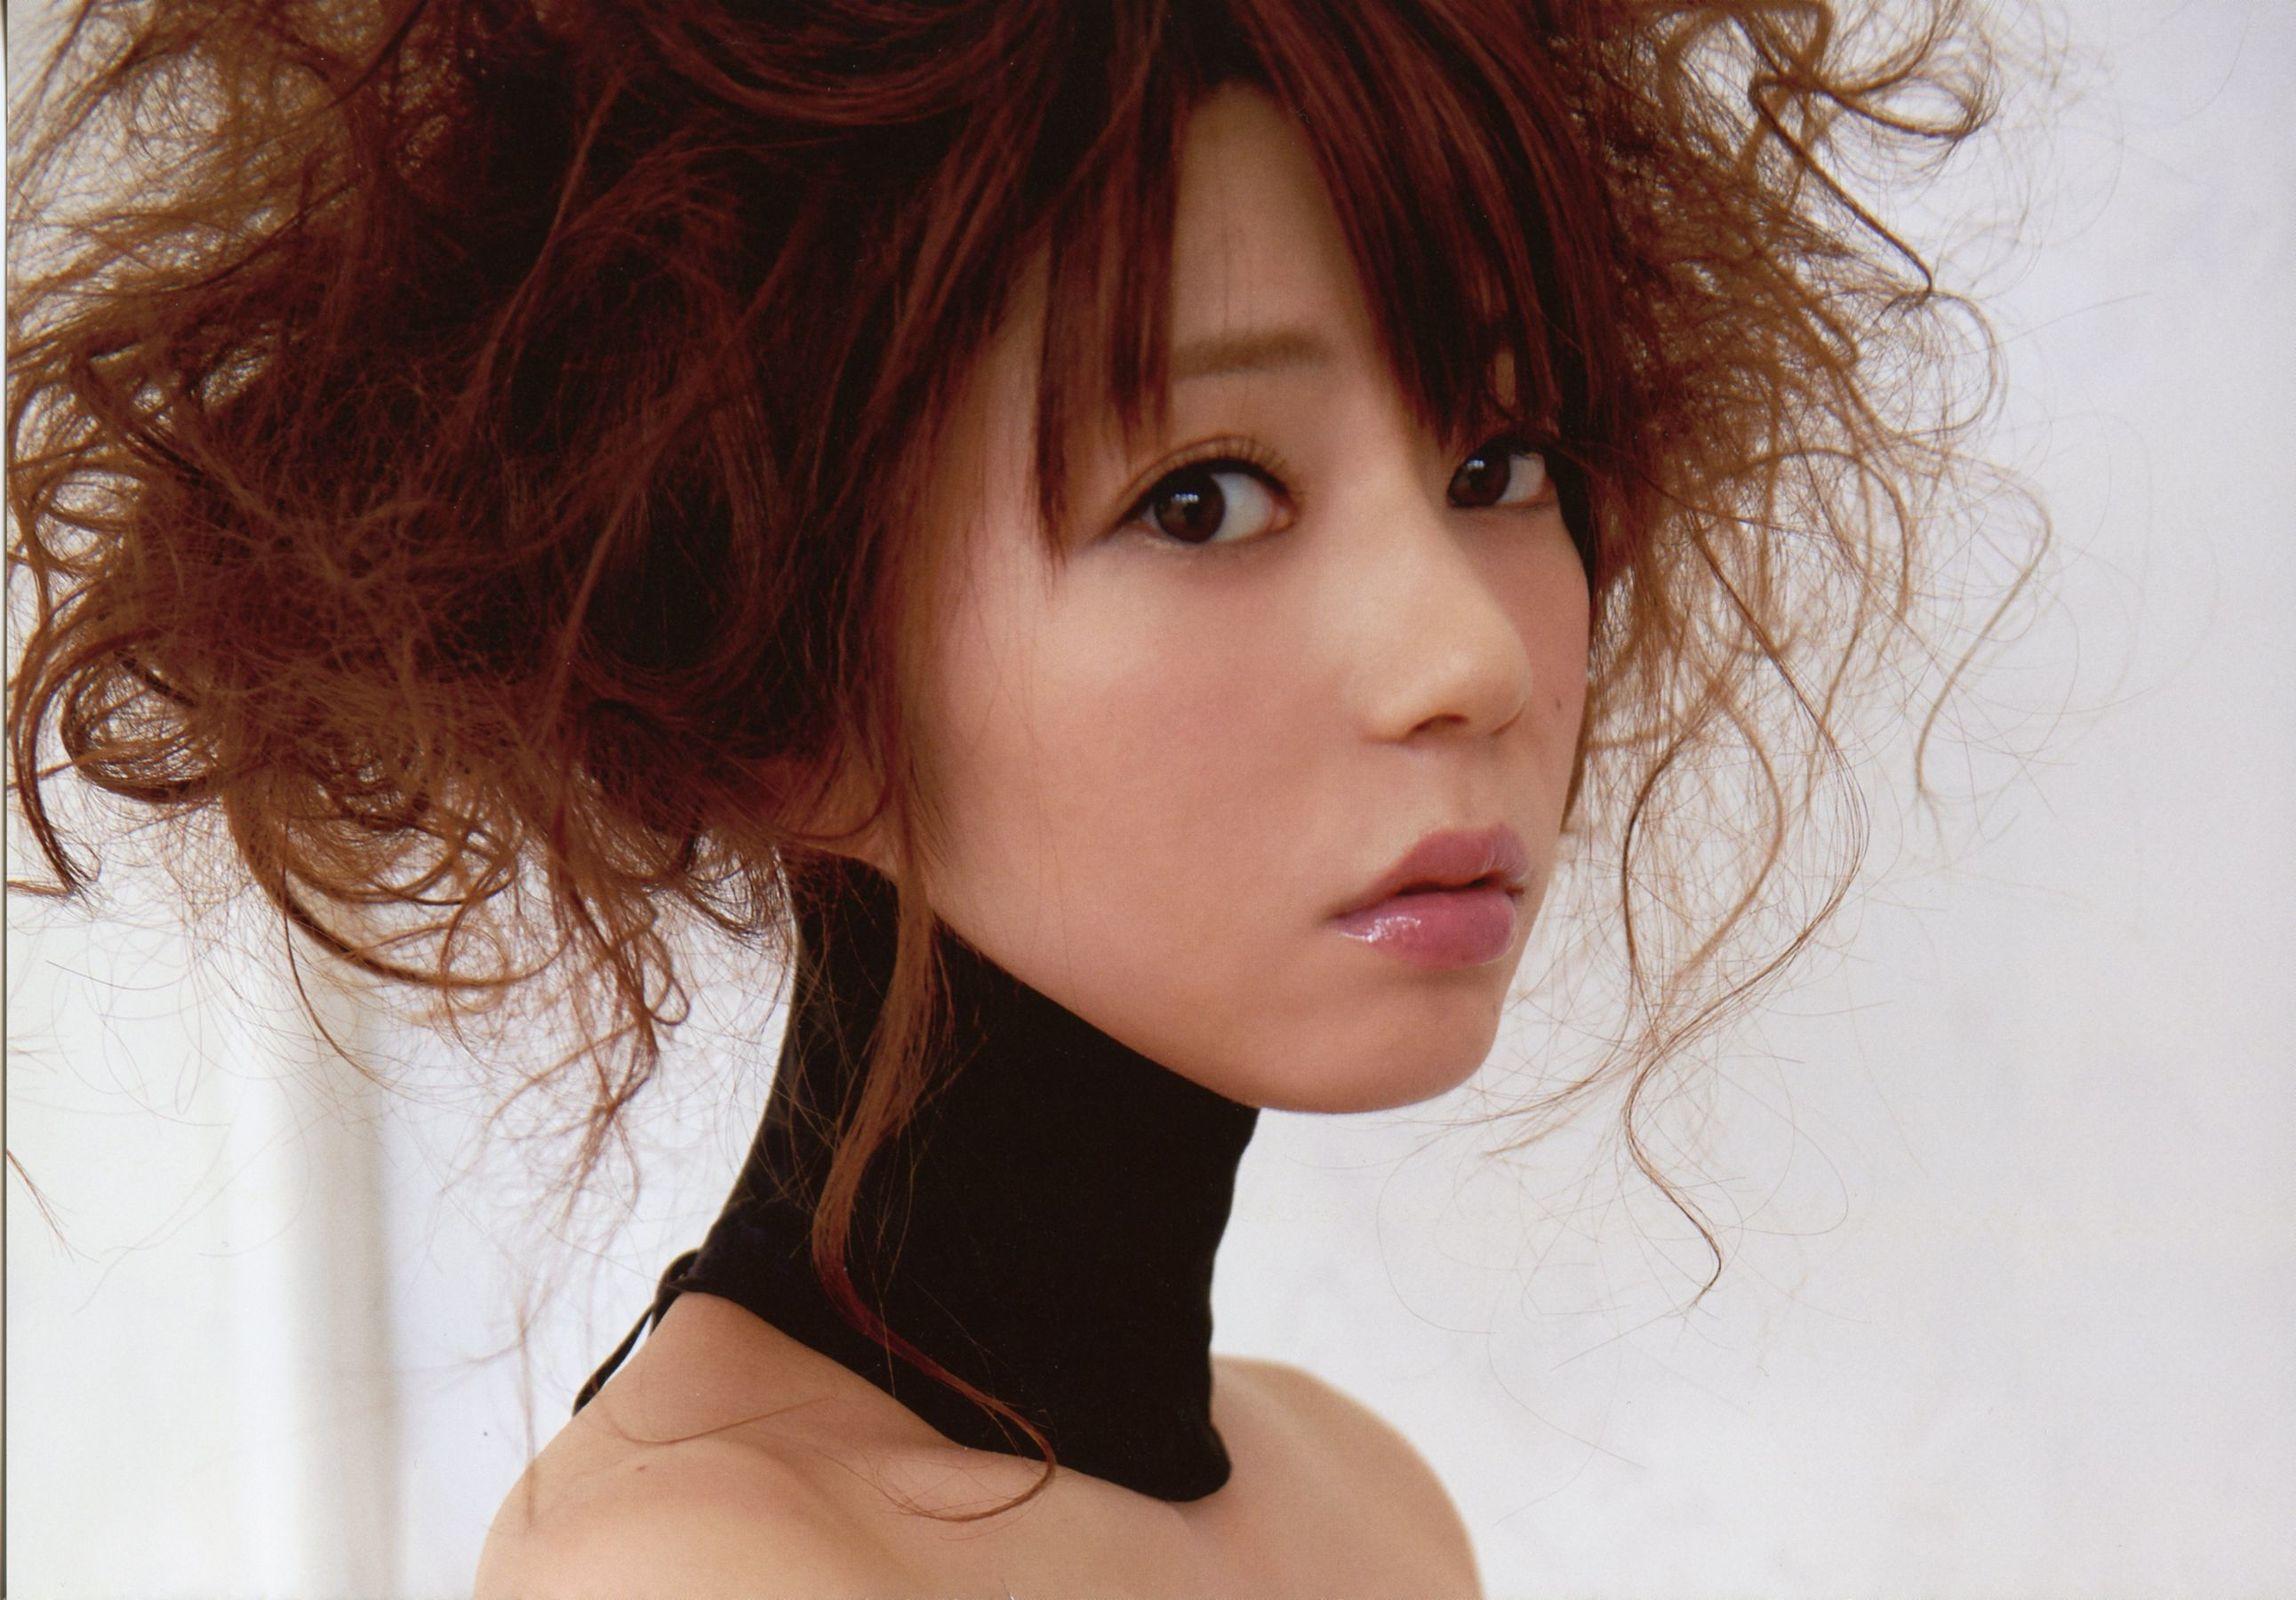 芳賀優里亜芳贺优里亚 Yuria Haga 「赤×ピンク」写真集